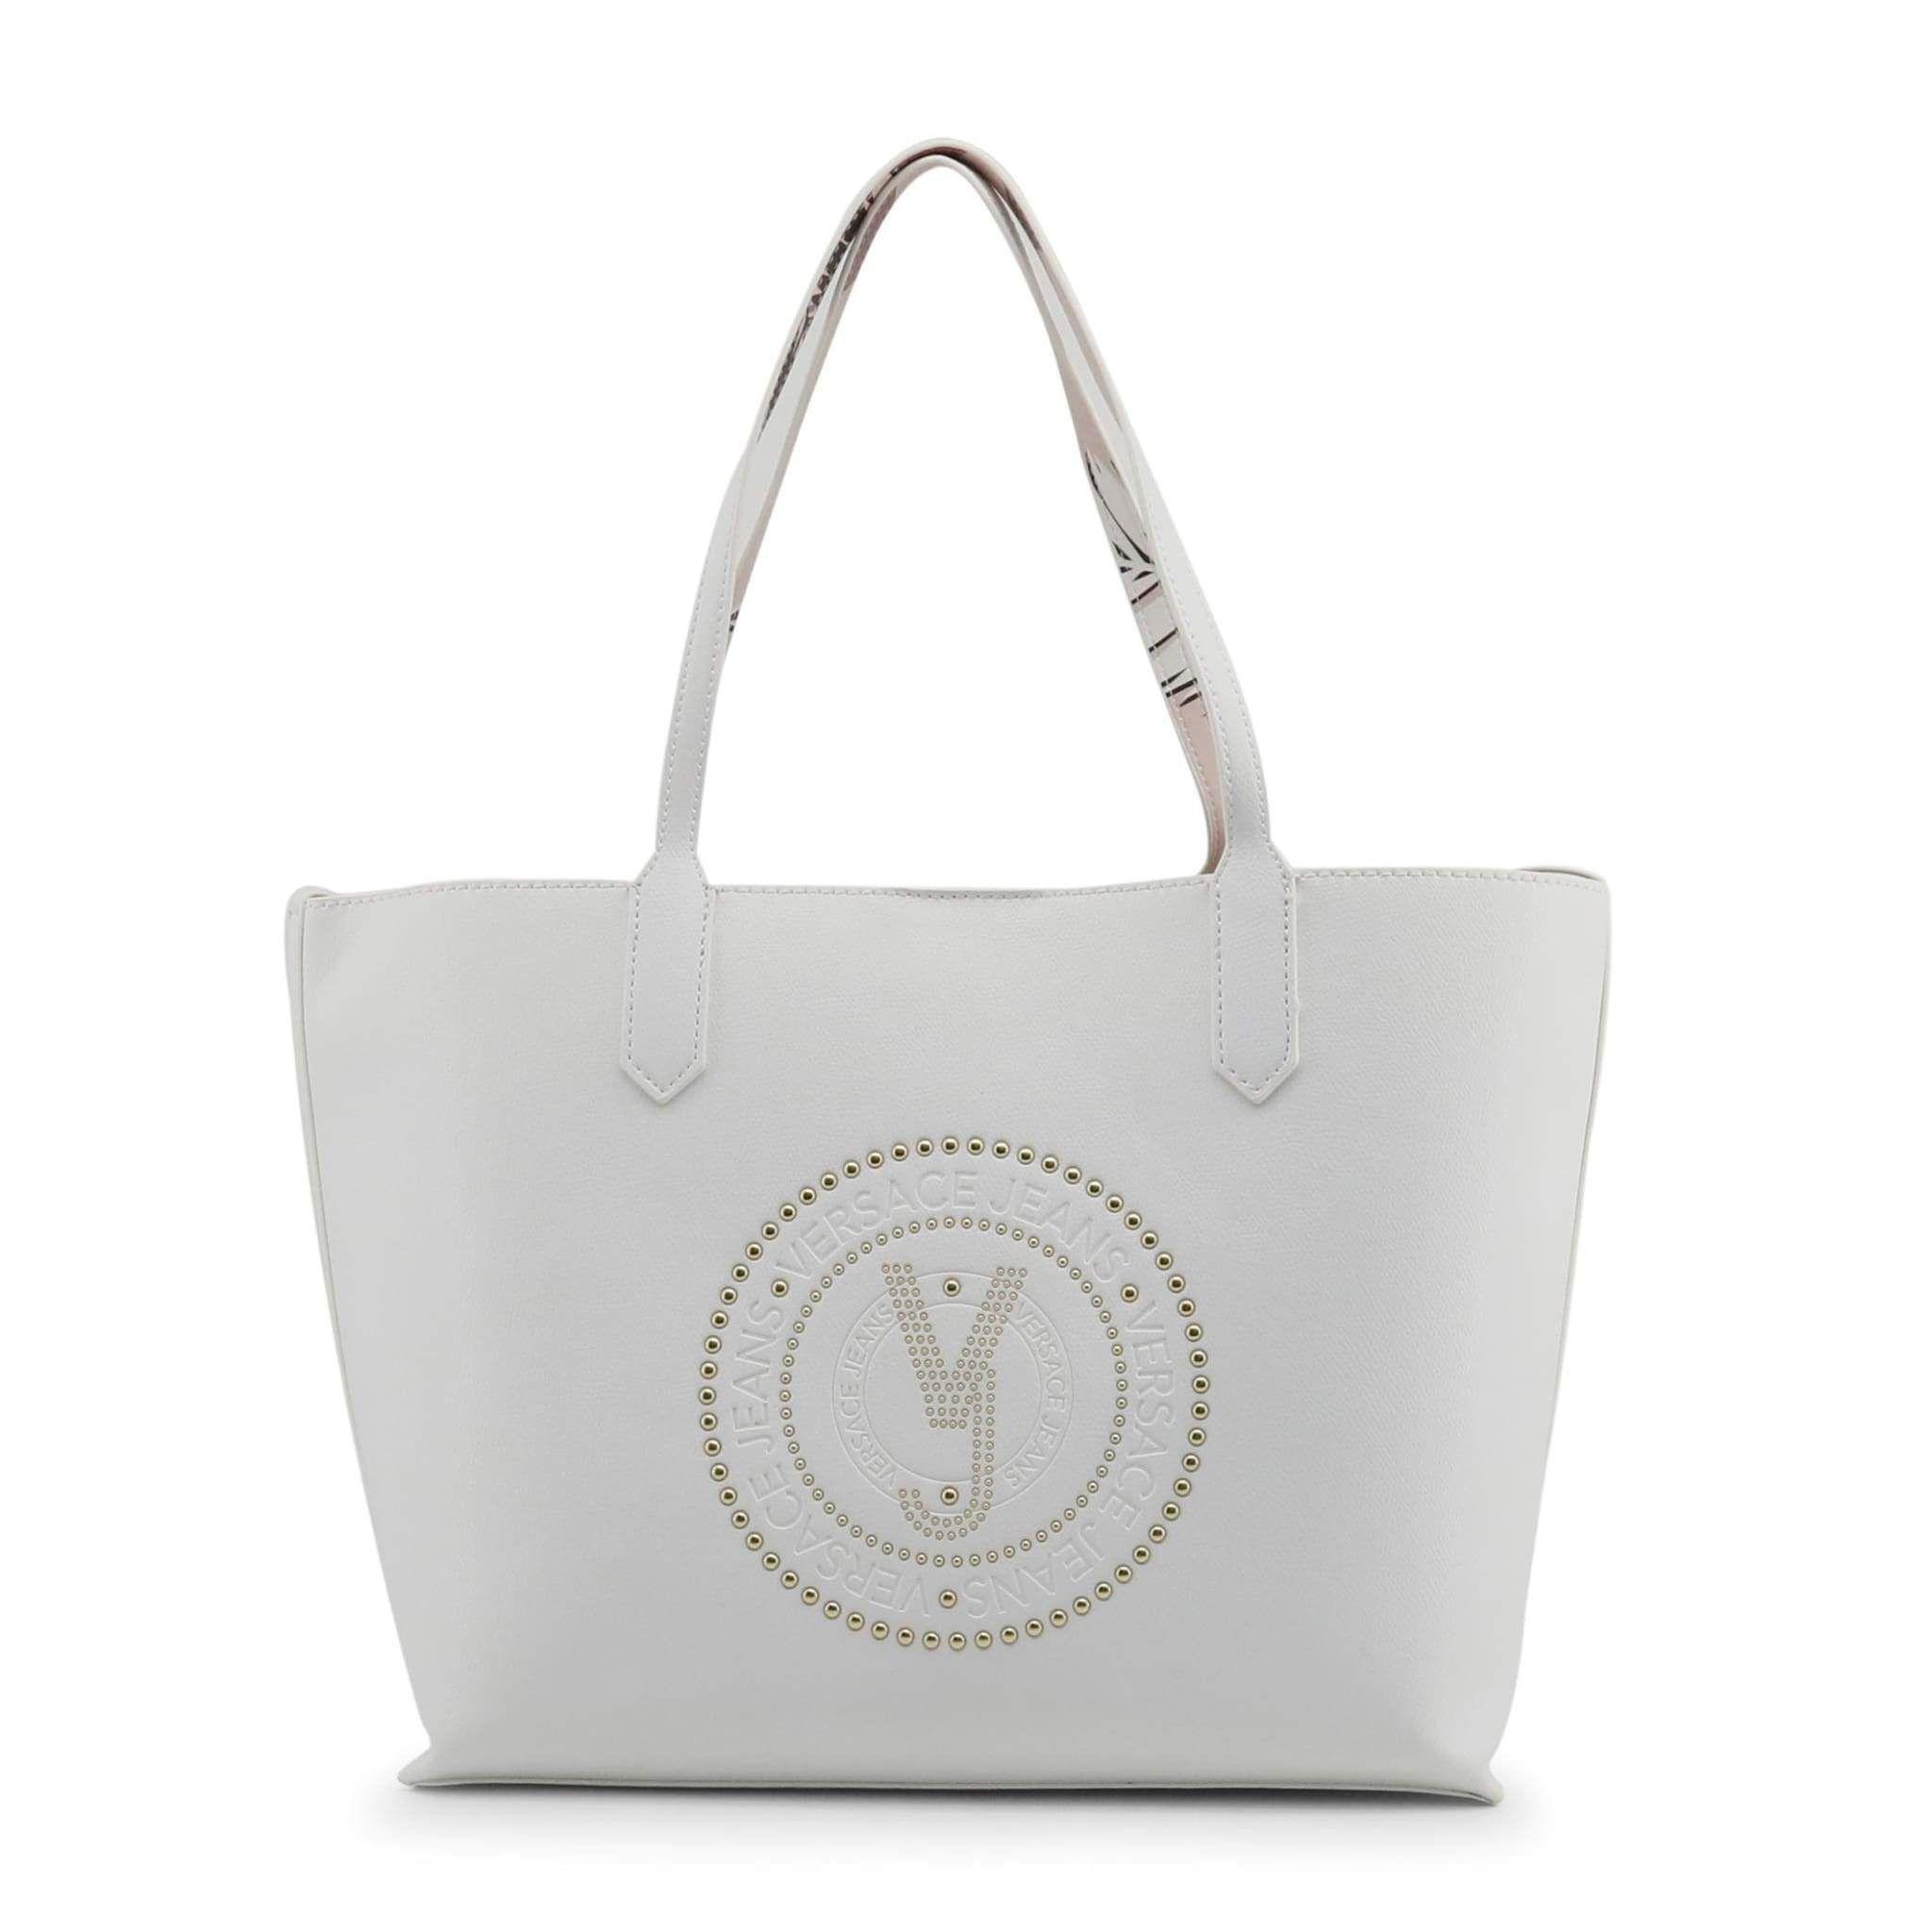 Absolutely Stunning Versace Jeans E1Vrbbqb Women White Shopping bags ... e3a9b04c42